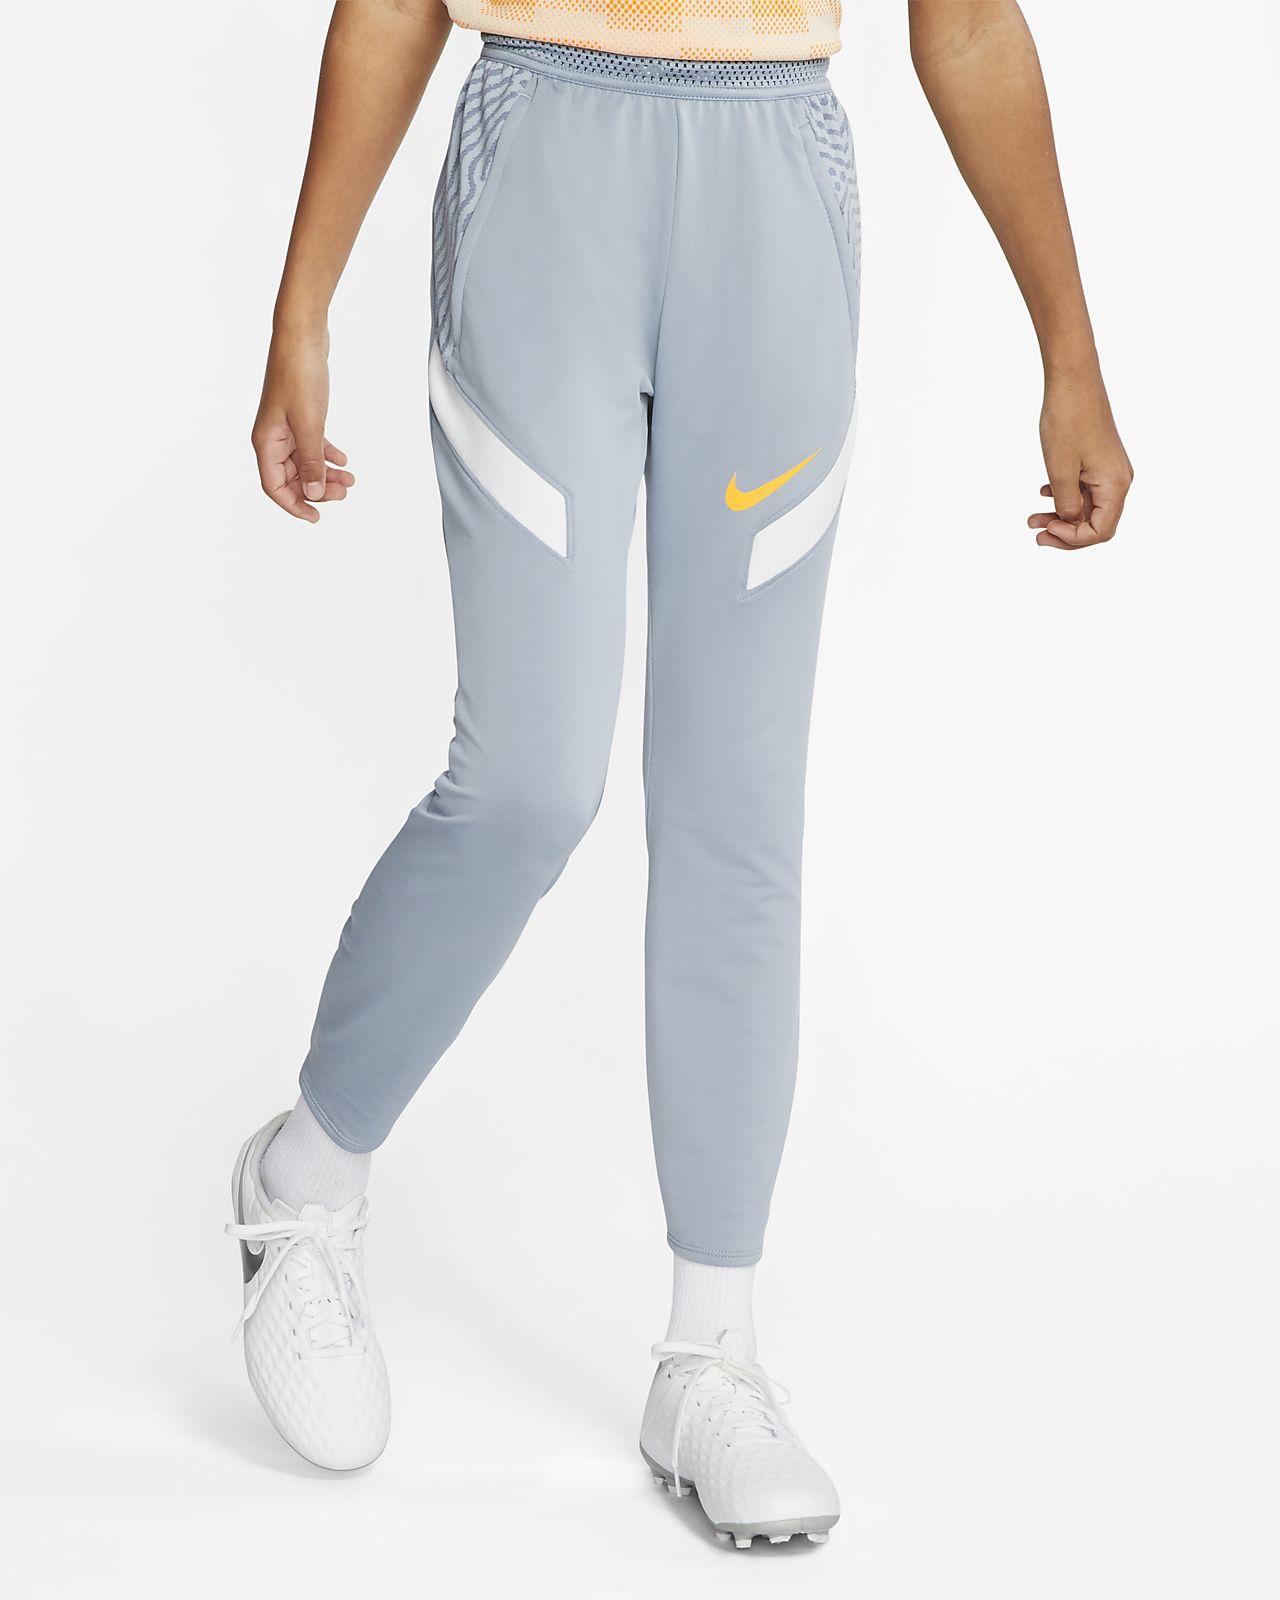 Pantalon de football Nike Dri-FIT Strike pour Enfant plus âgé